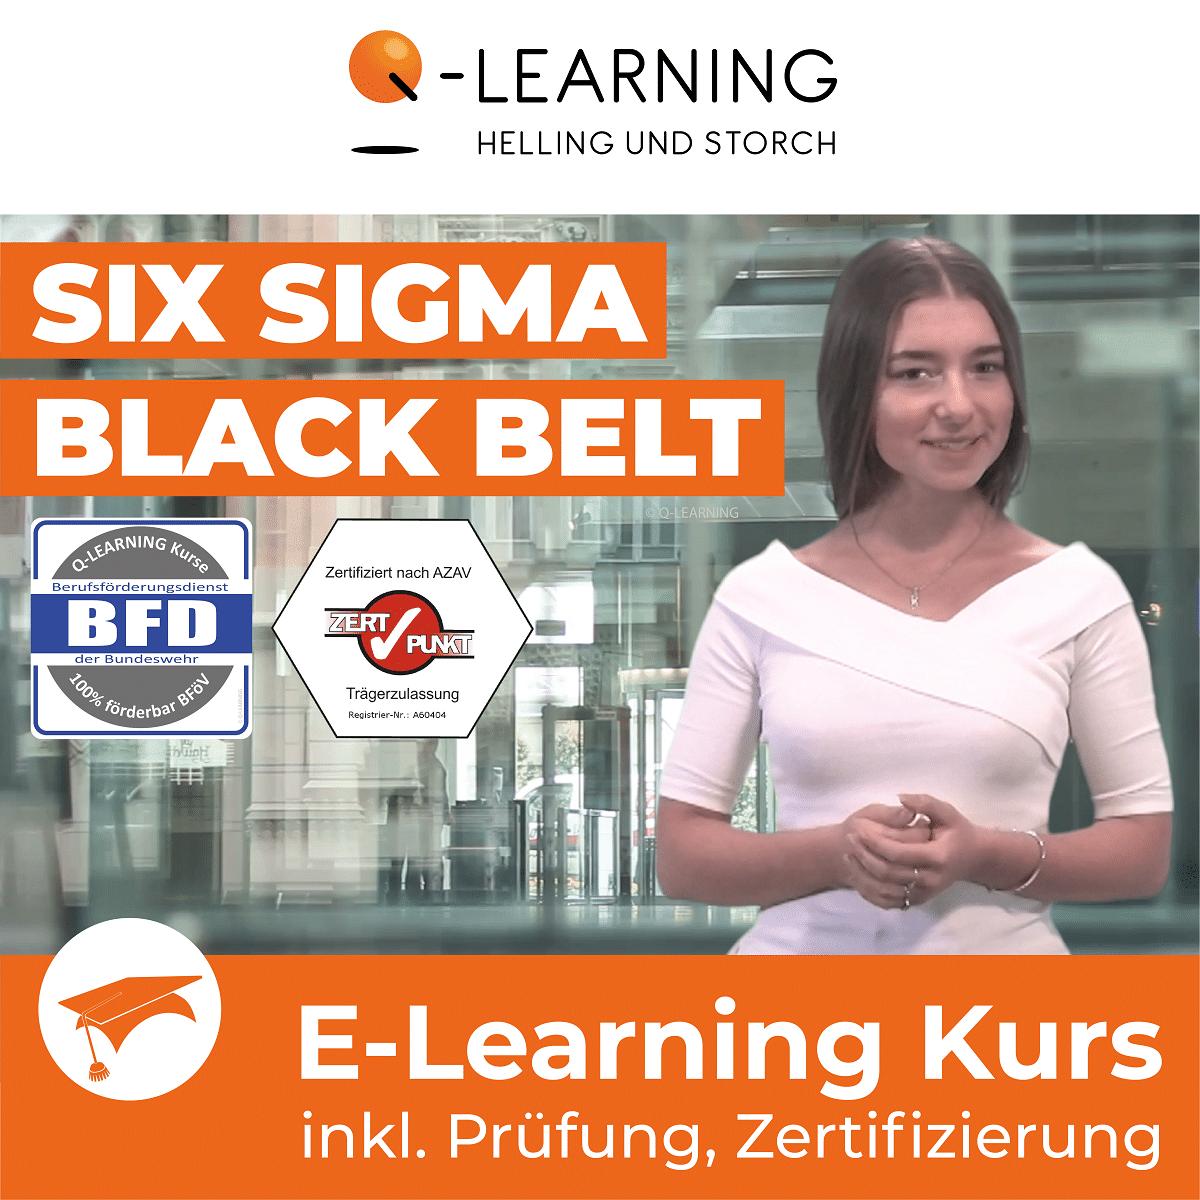 Produktbild SIX SIGMA BLACK BELT | BFD